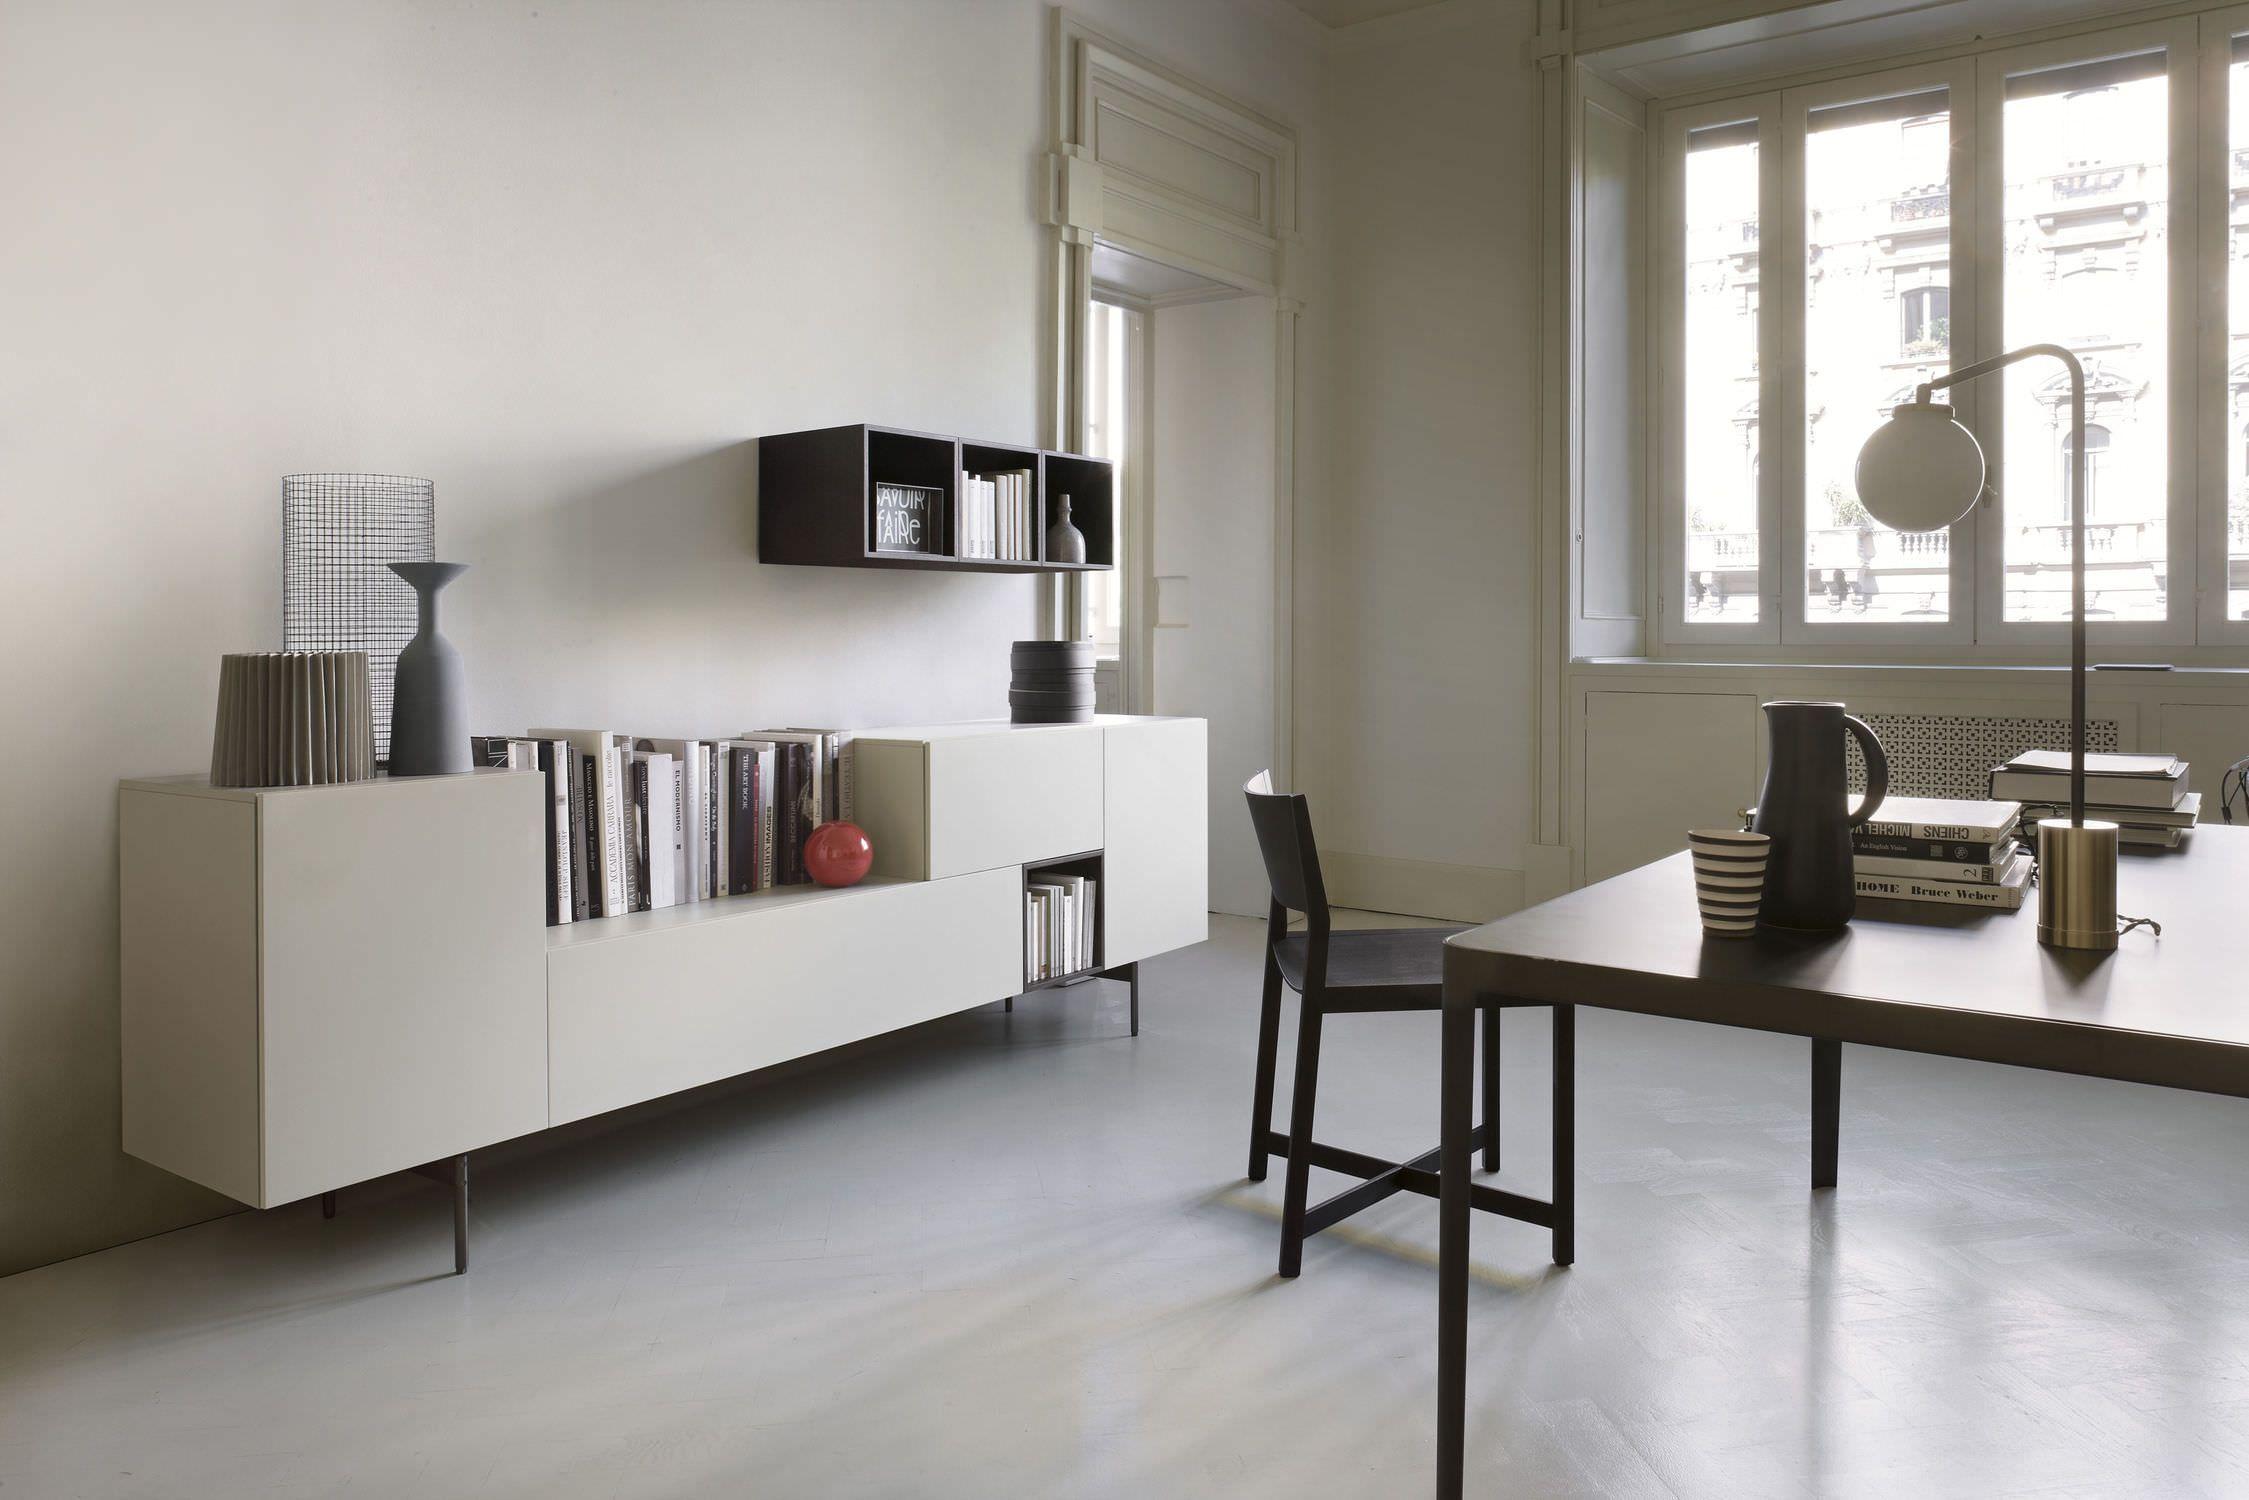 Lema Mobili T030.Contemporary Living Room Wall Unit By Piero Lissoni T030